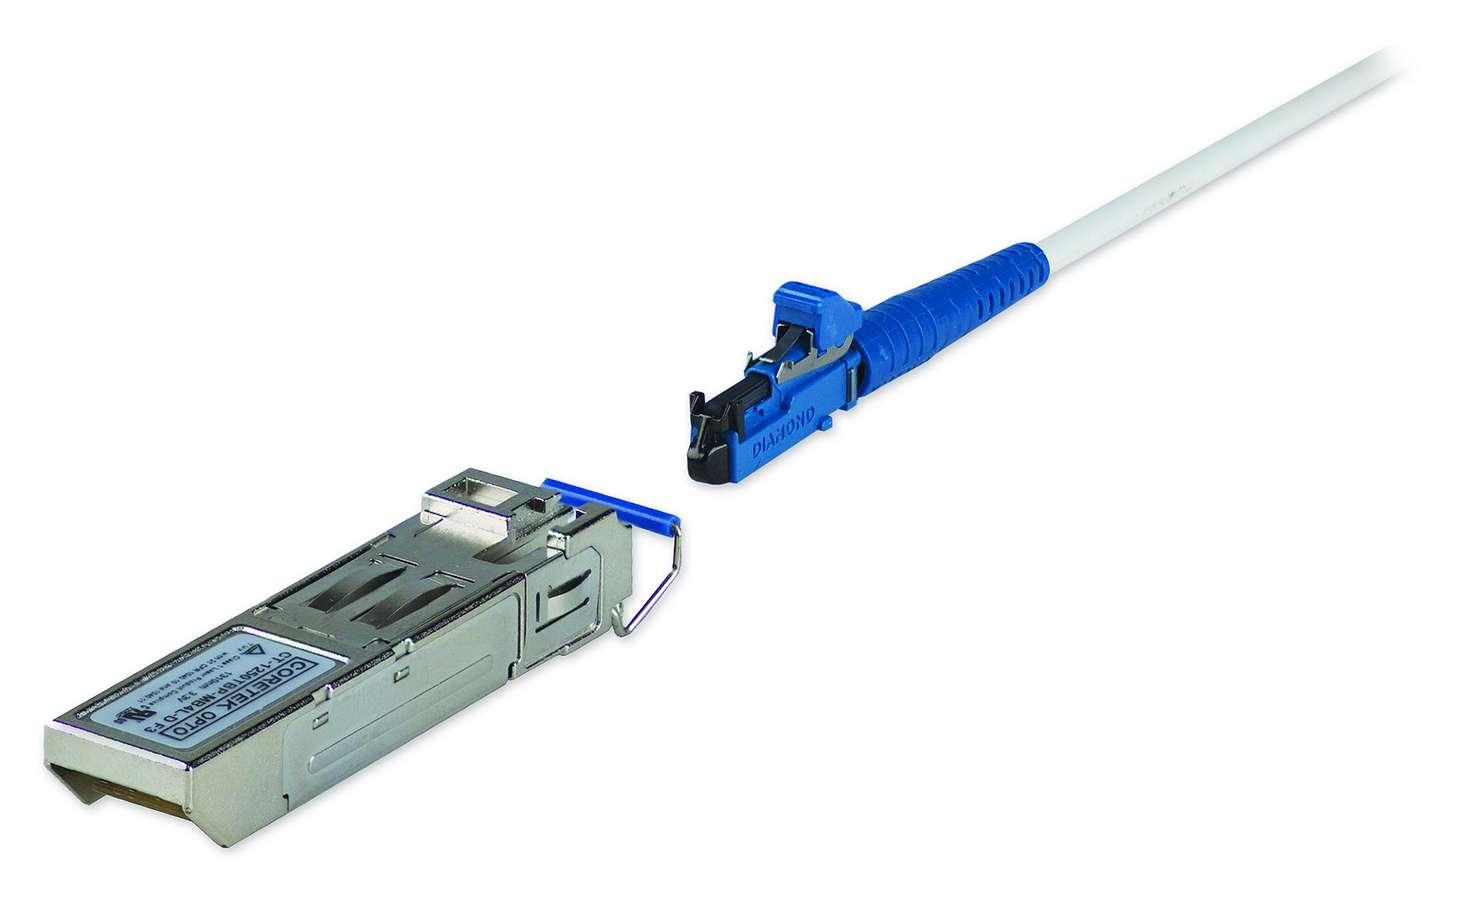 Phân loại module quang SFP